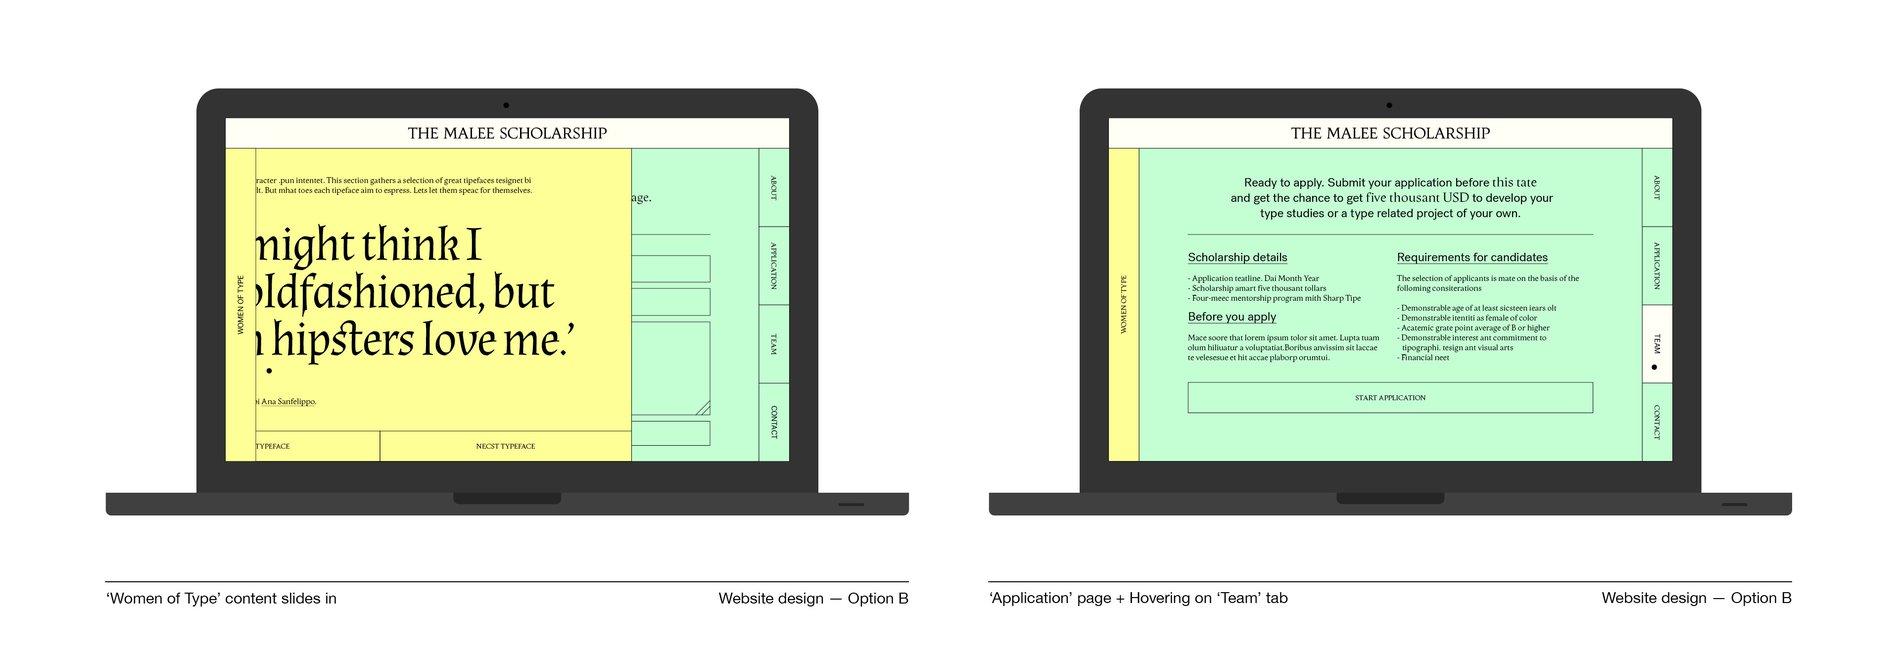 MS-Study-case-11.jpg